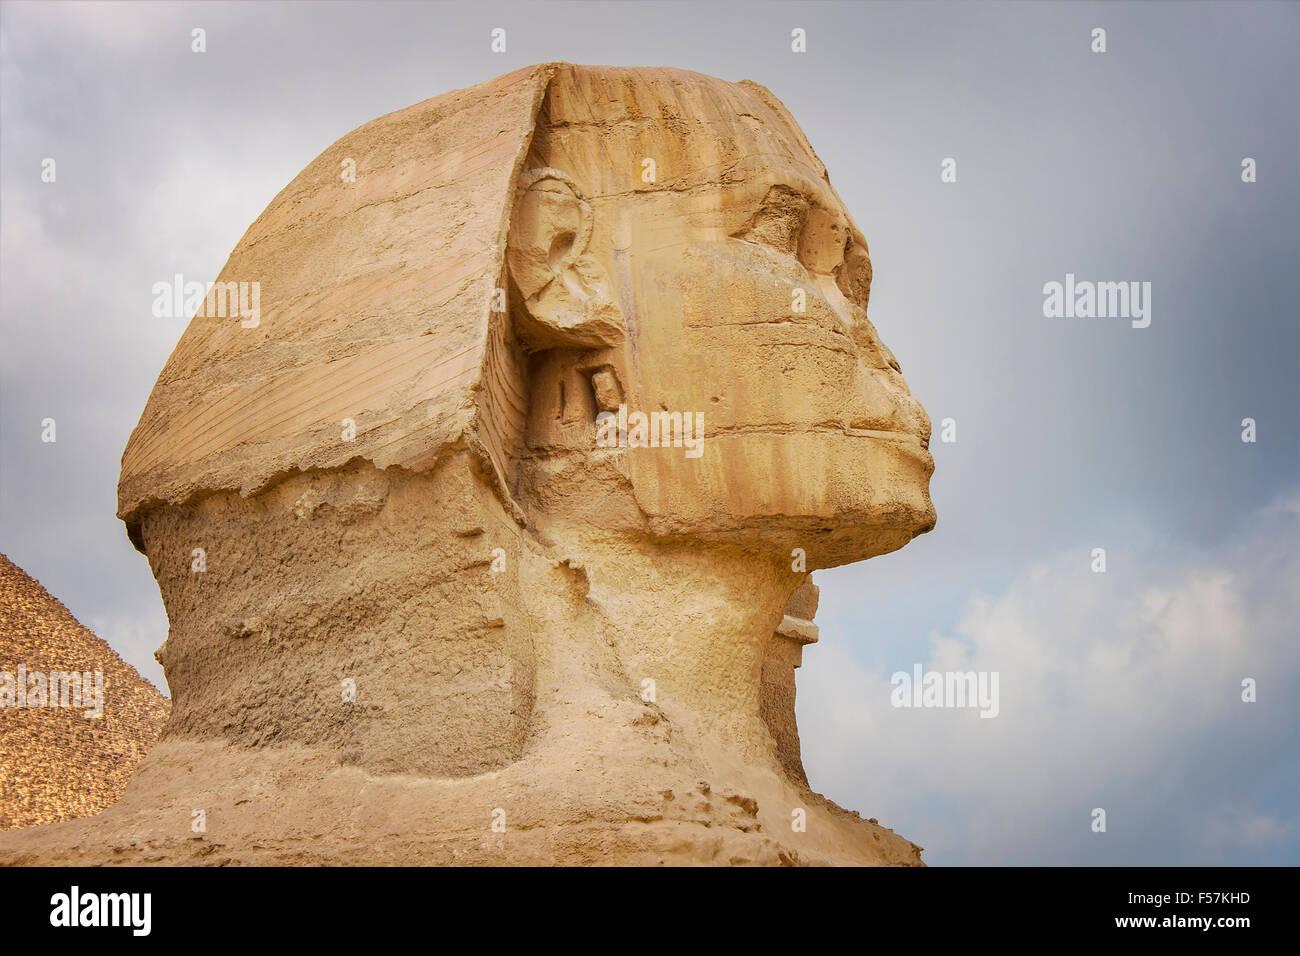 Imagen de la Esfinge de Egipto, El Cairo Gixa. Imagen De Stock